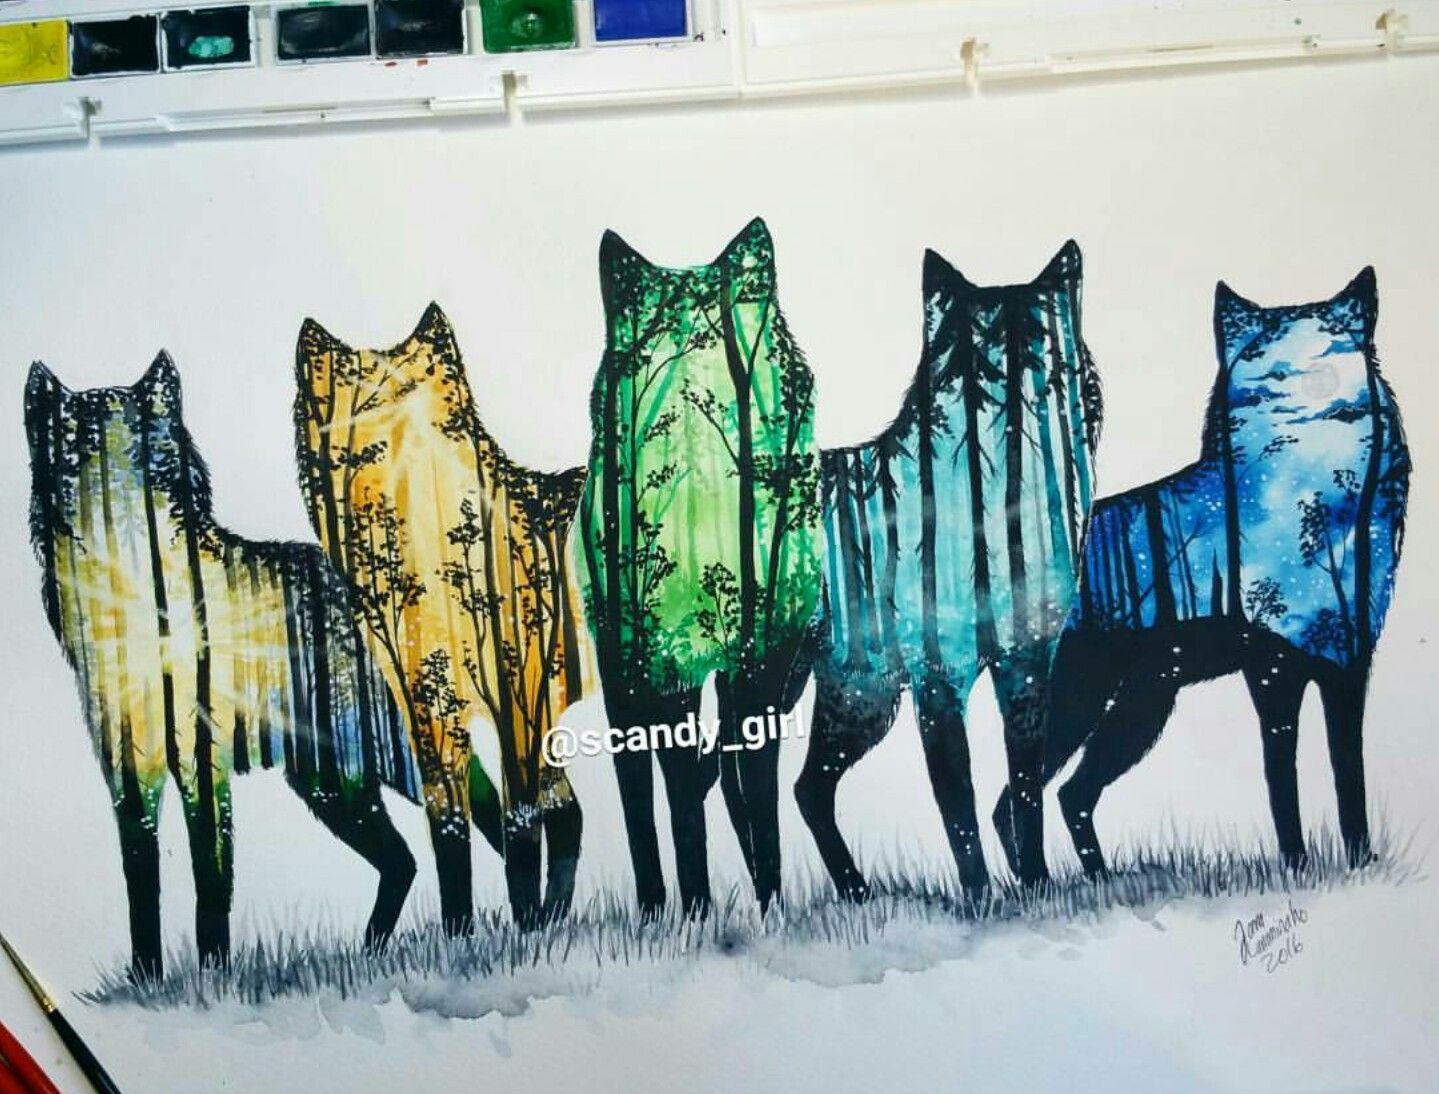 Watercolour Art By Jonna Scandy Girl Art By Jonna Scandy